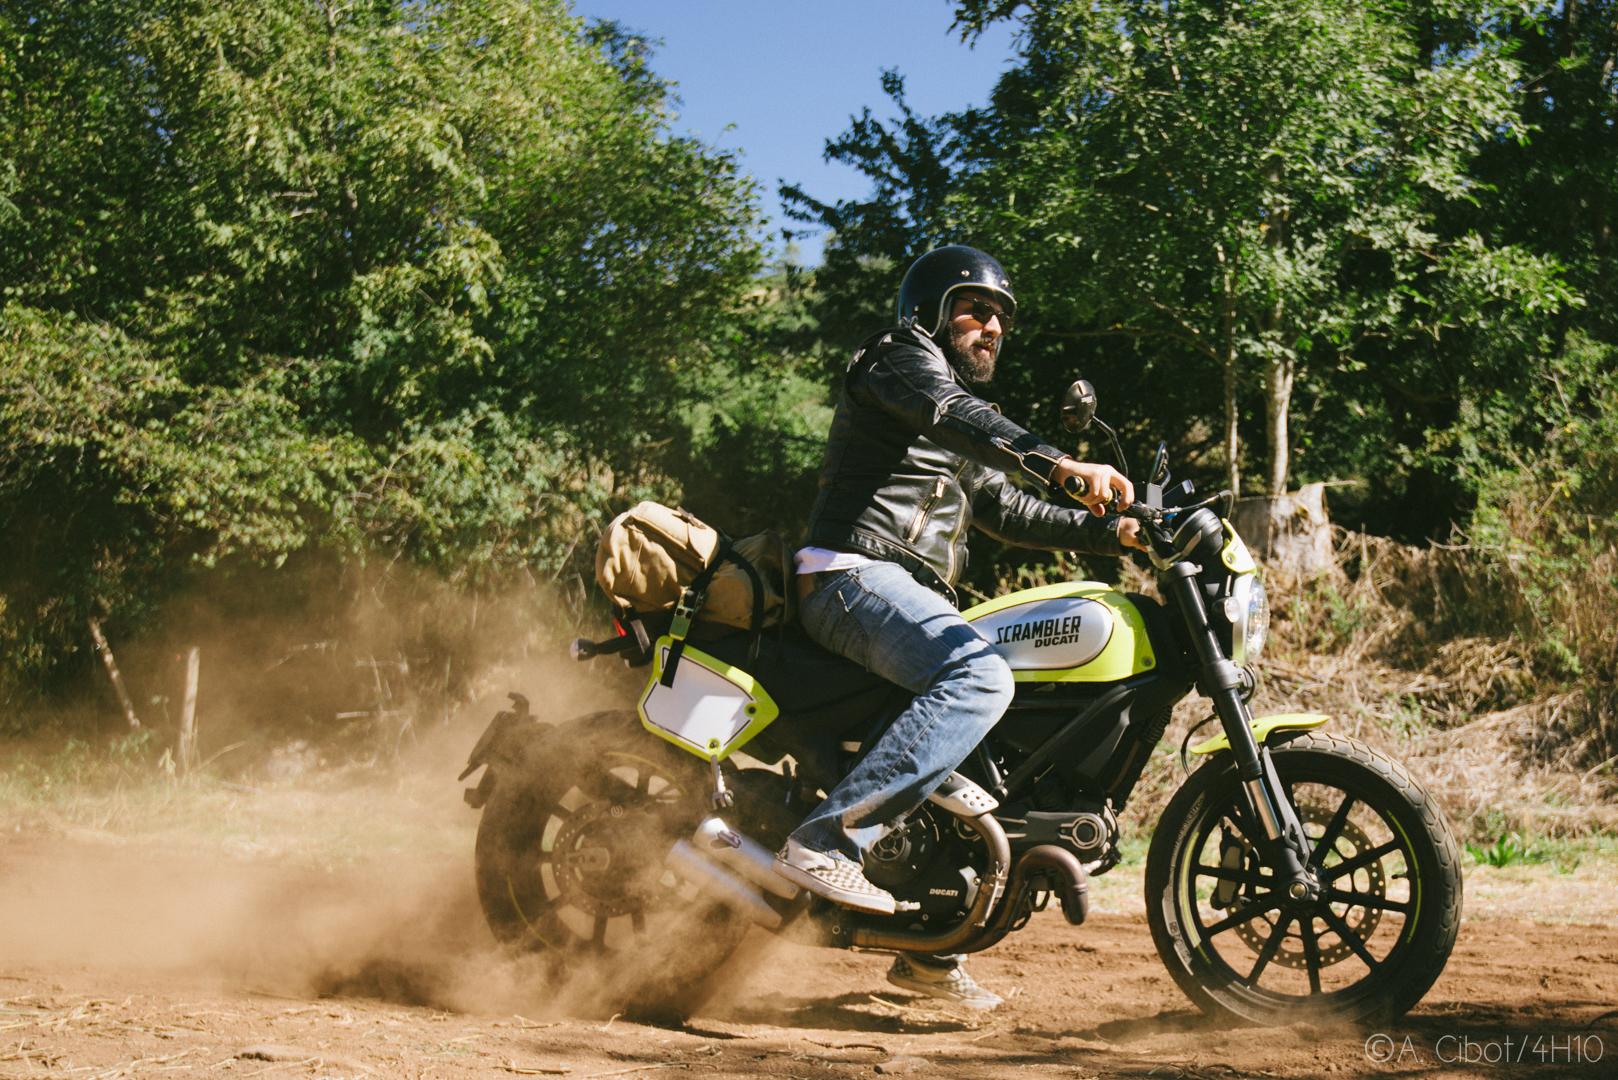 roadtrip-moto-auvergne-saint-flour-cantal-ballade-itineraire-4h10-ninety-scrambler14